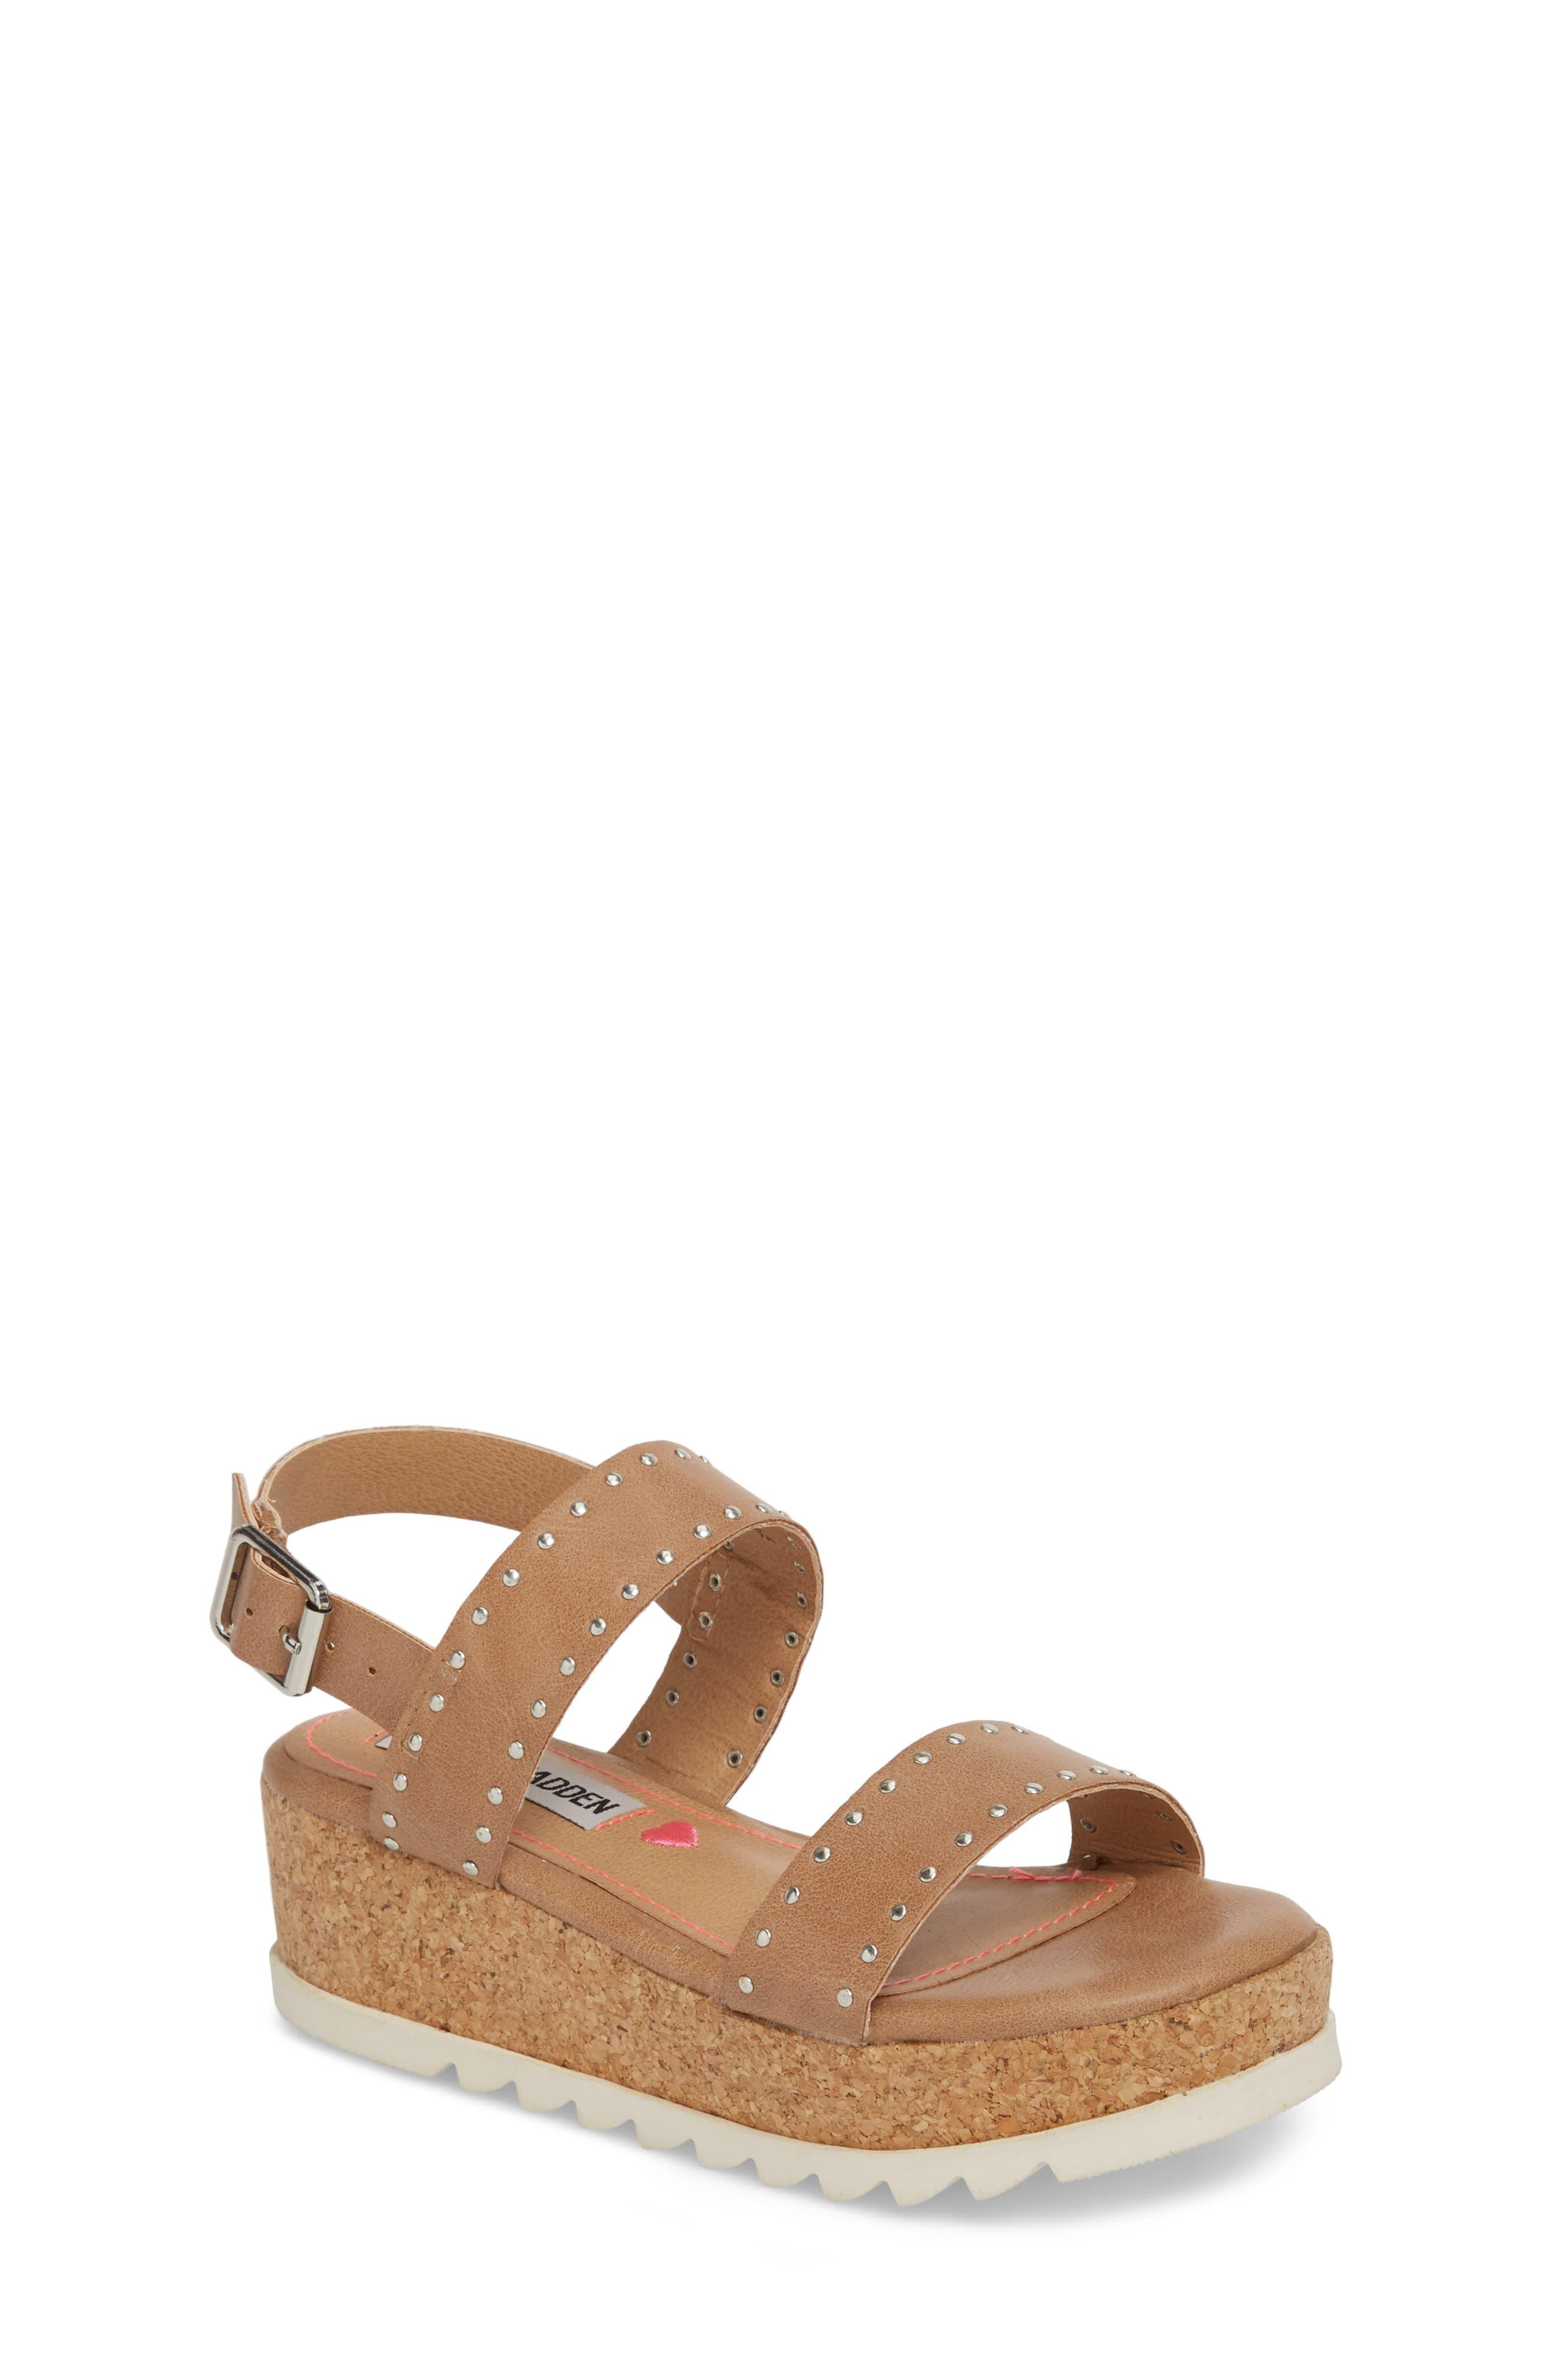 STEVE MADDEN,                             JKRISTIE Platform Sandal,                             Main thumbnail 1, color,                             200